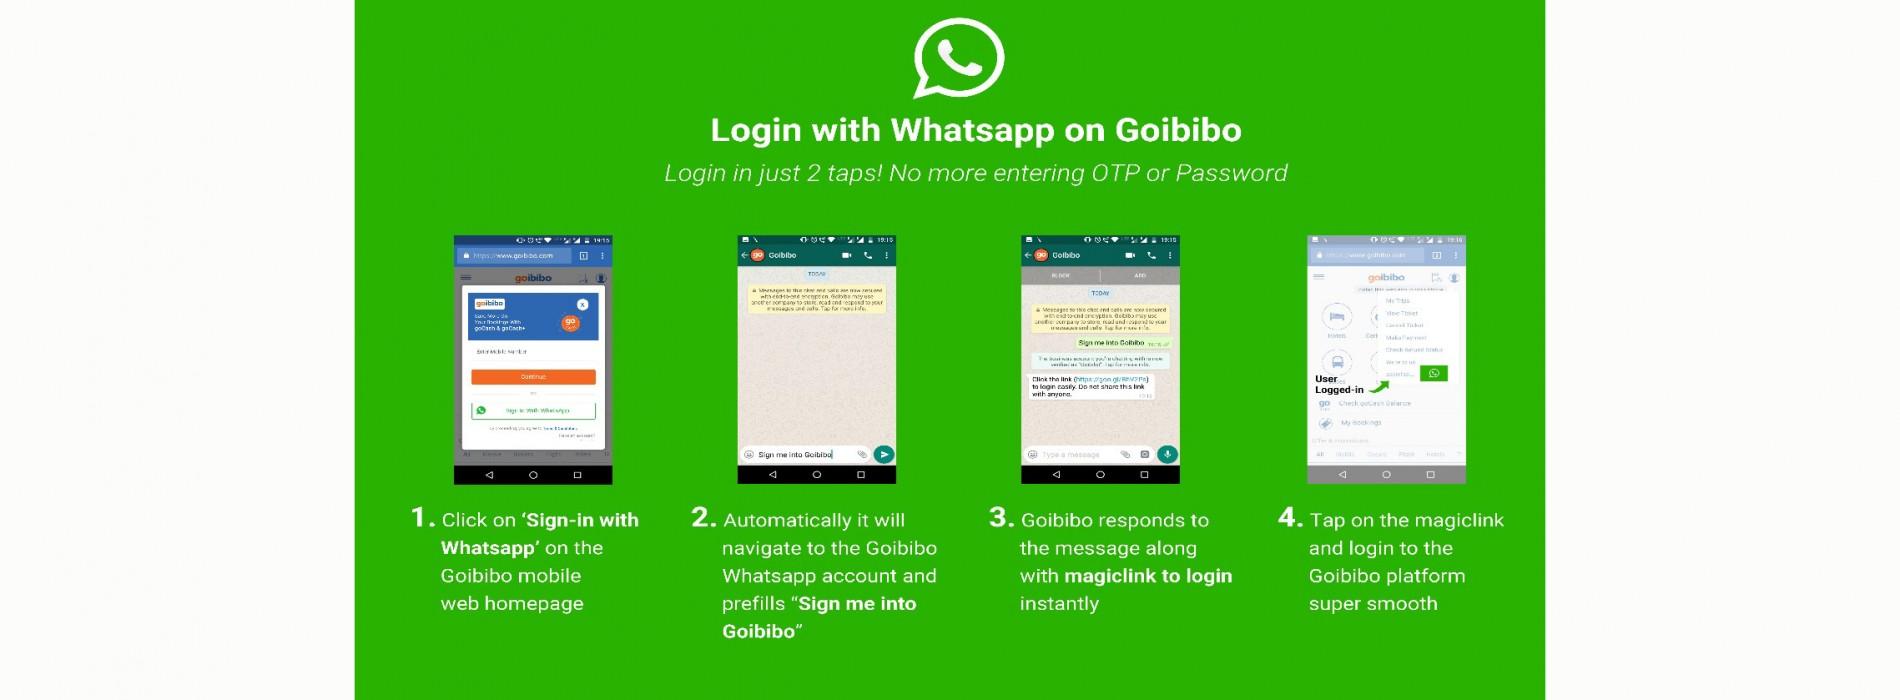 Goibibo introduces new login feature via WhatsApp